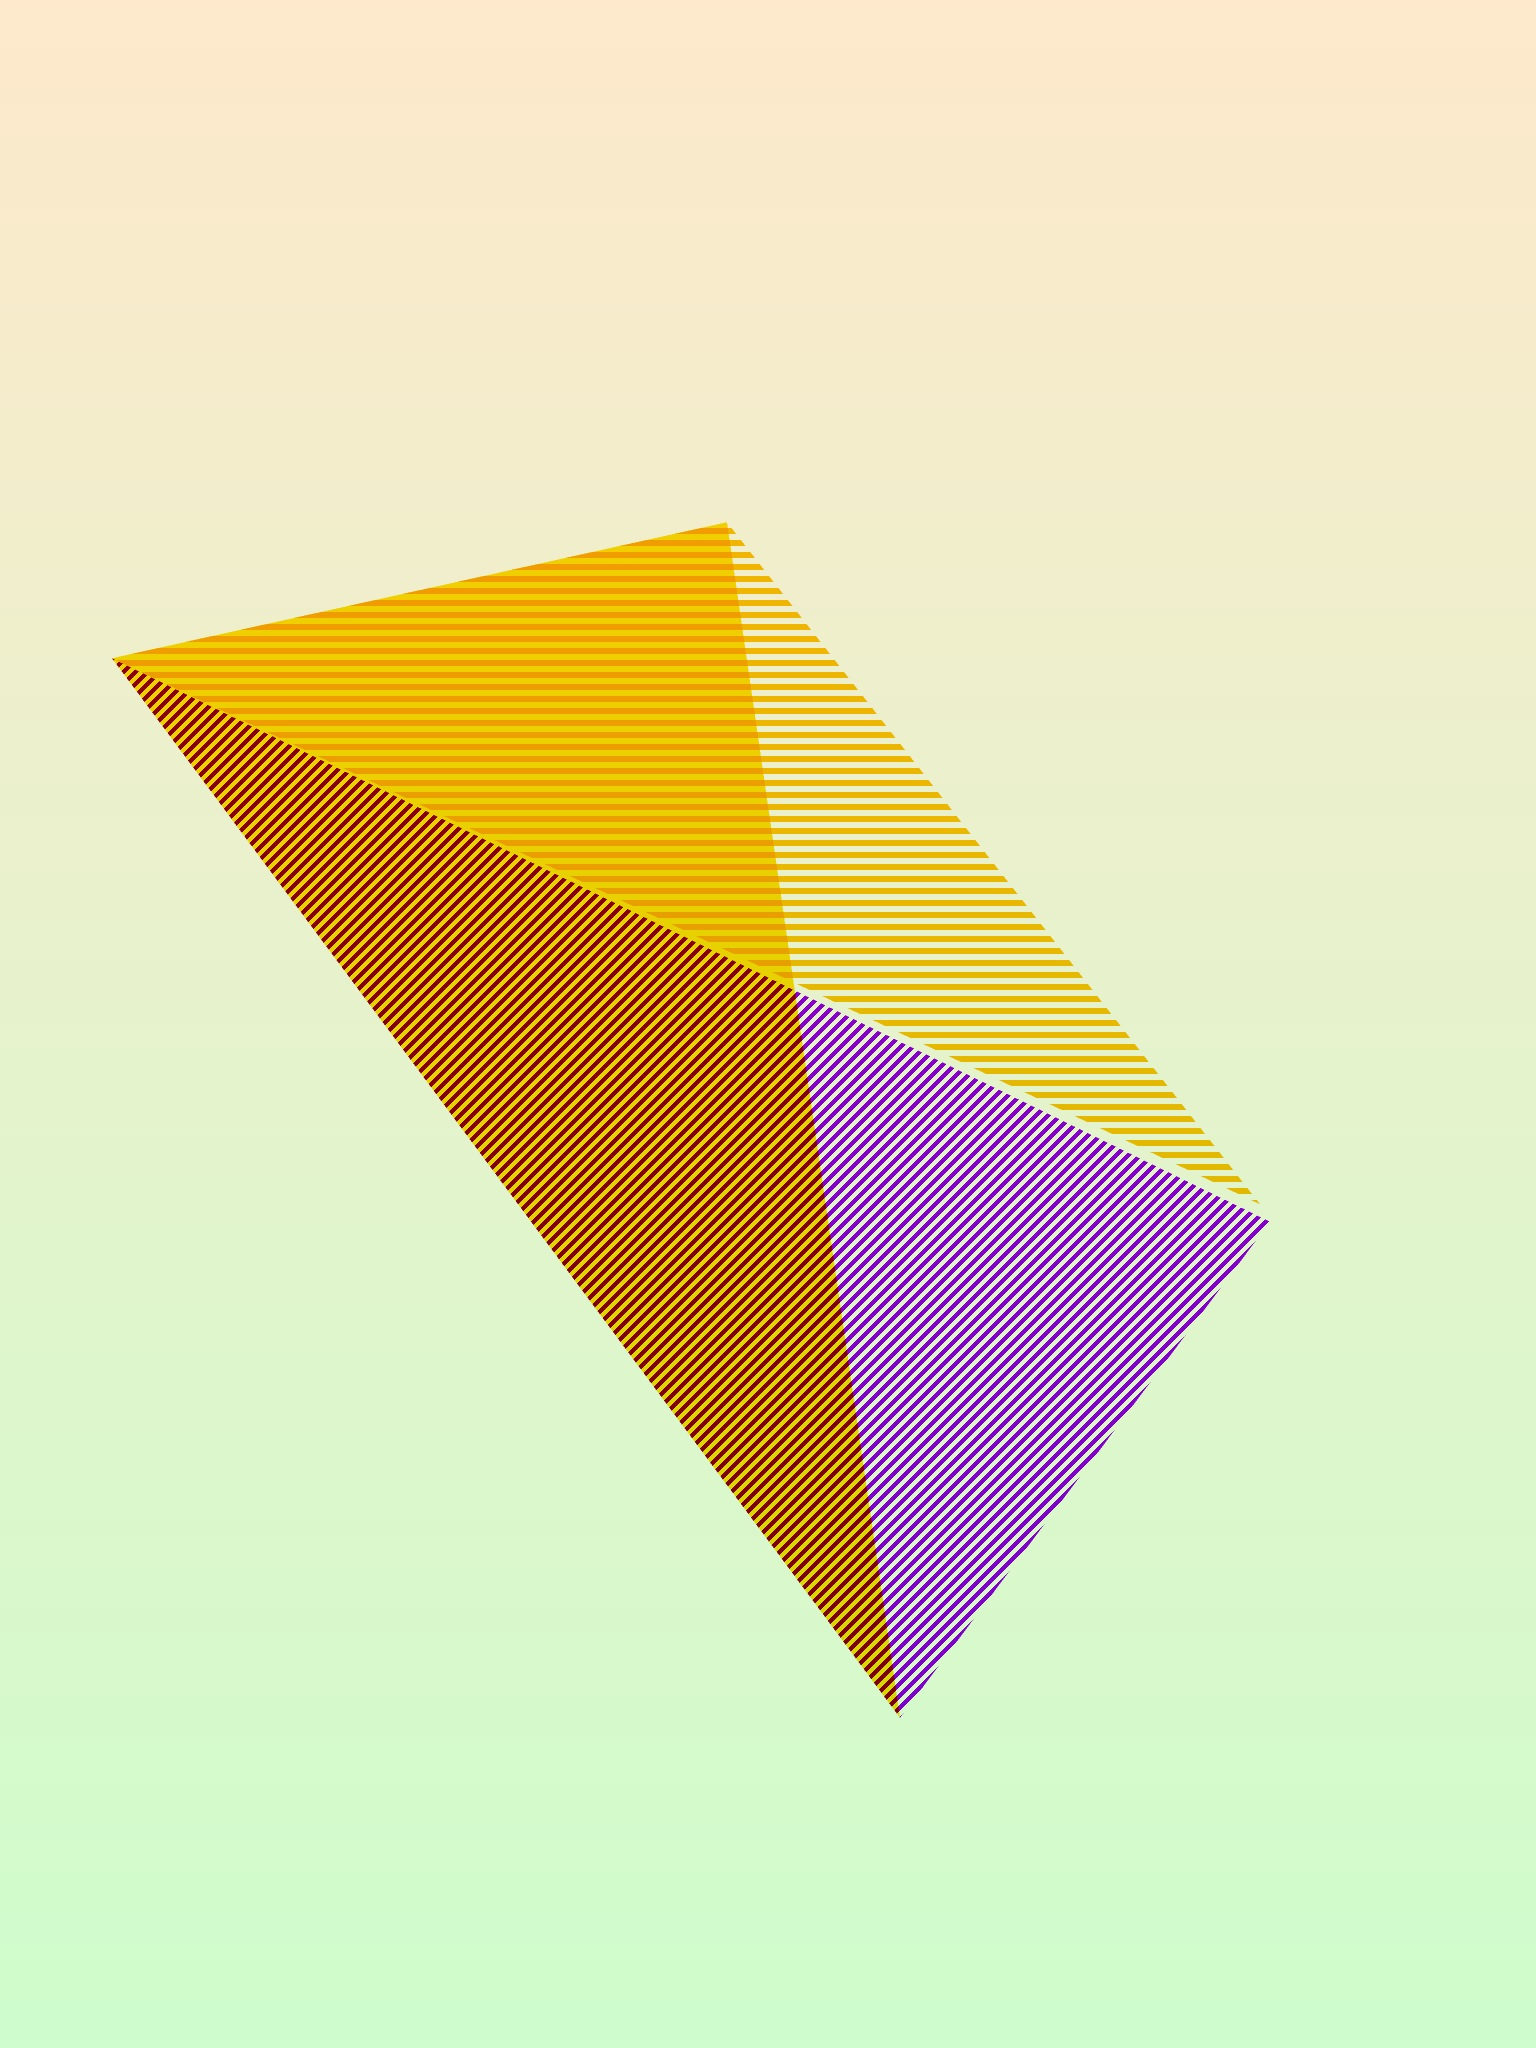 Triangulate_02